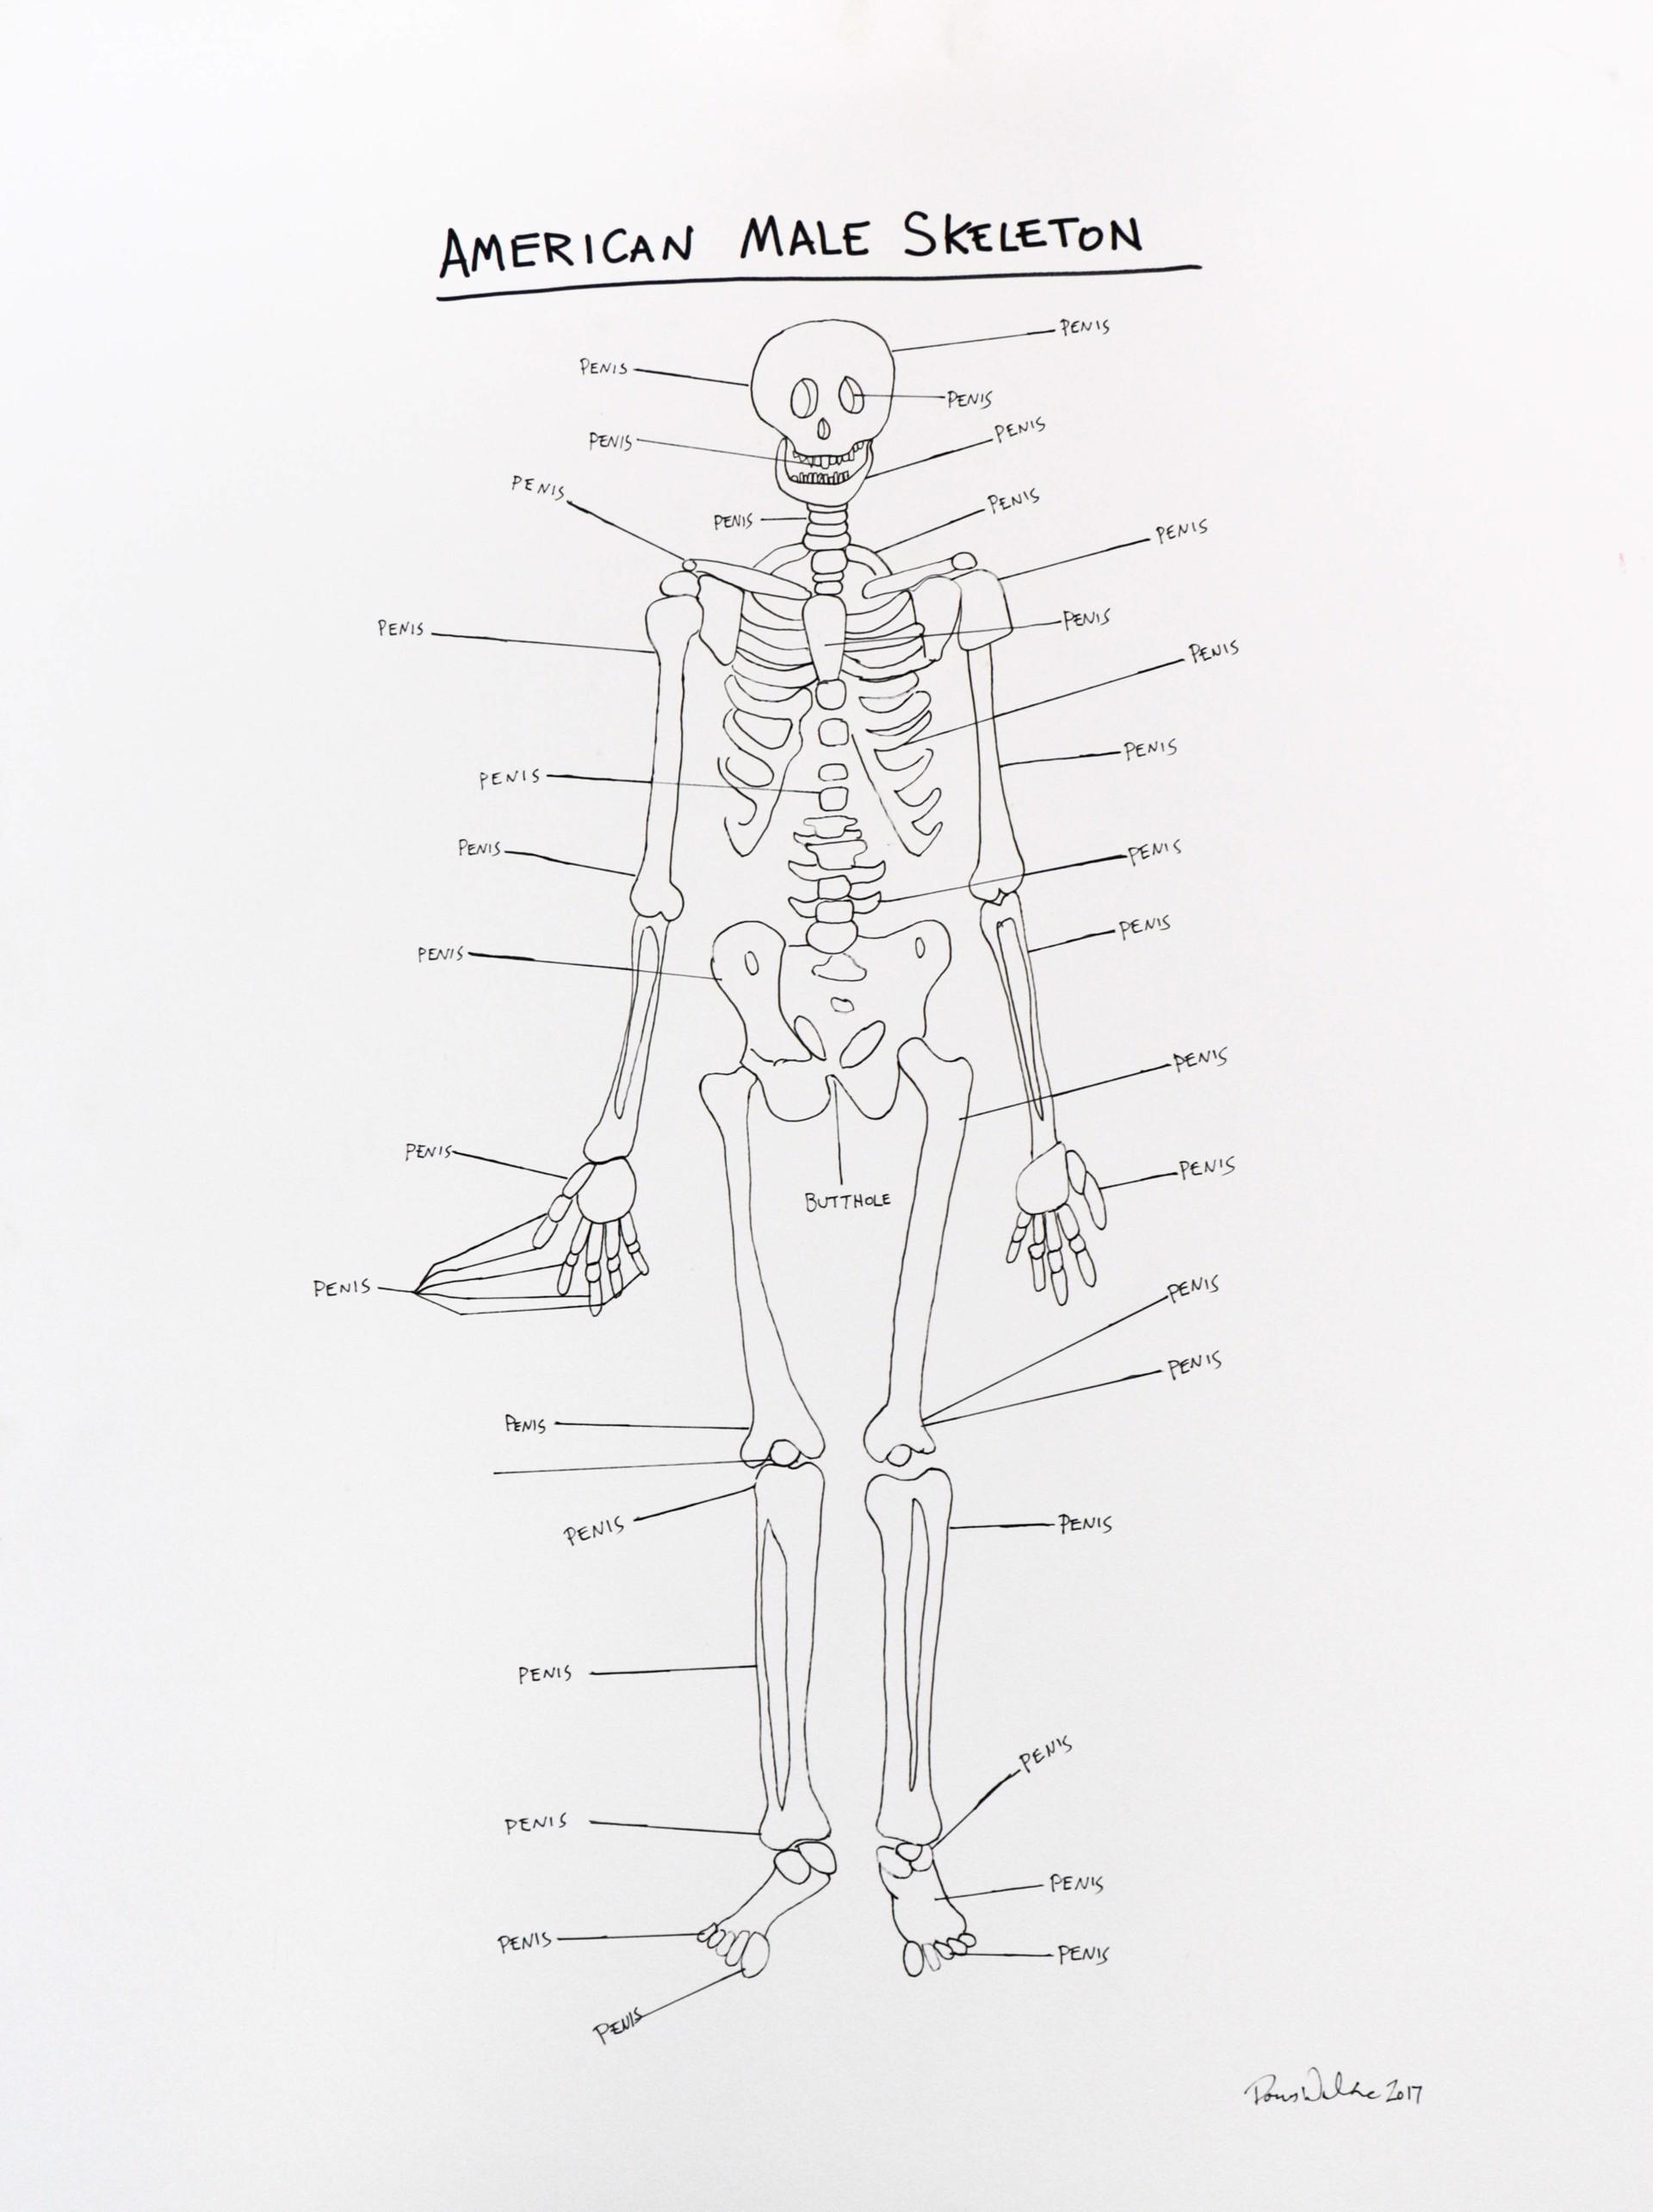 American Male Skeleton by Porous Walker